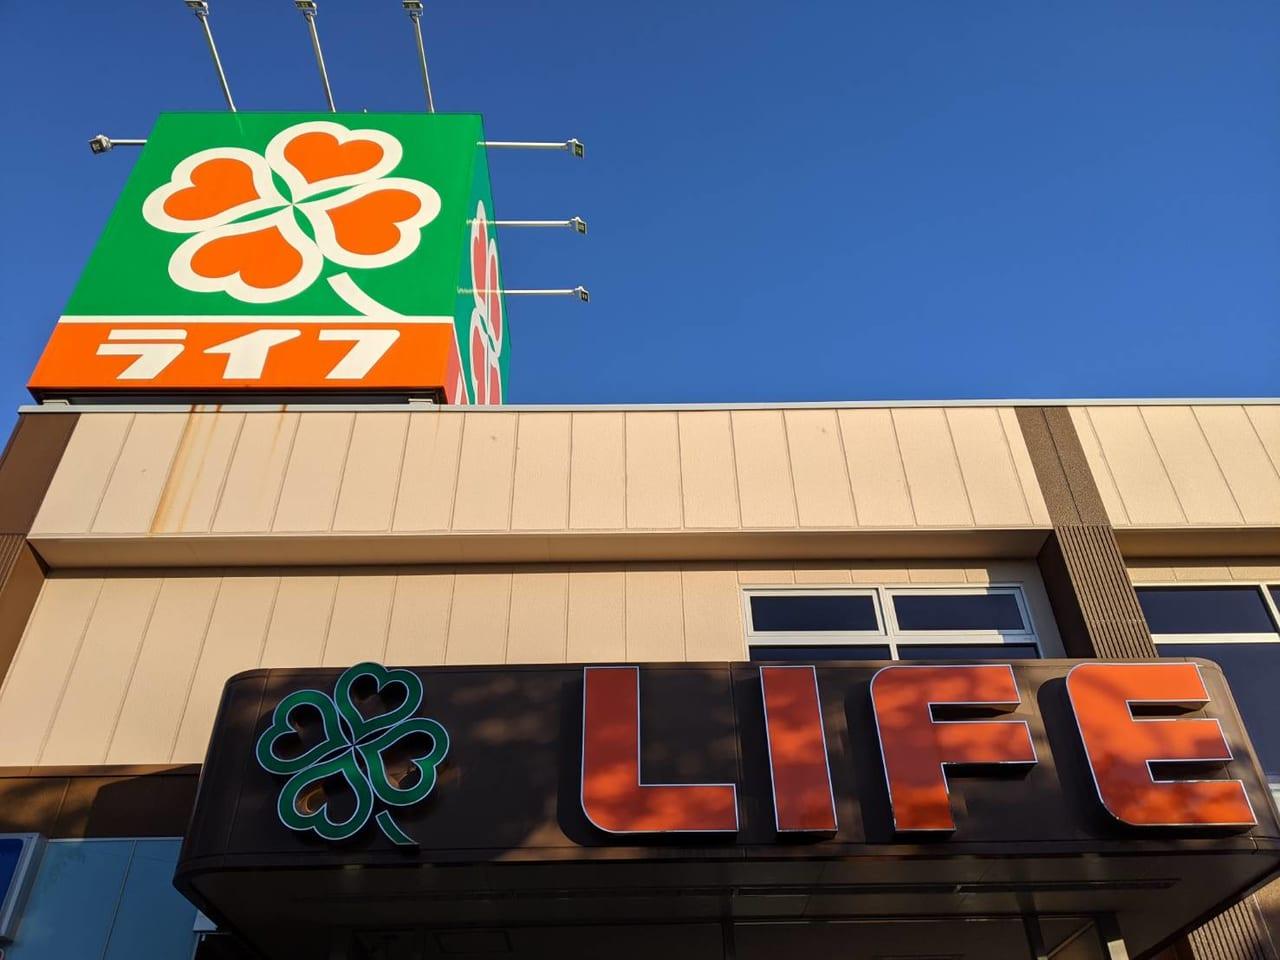 『LIFE』